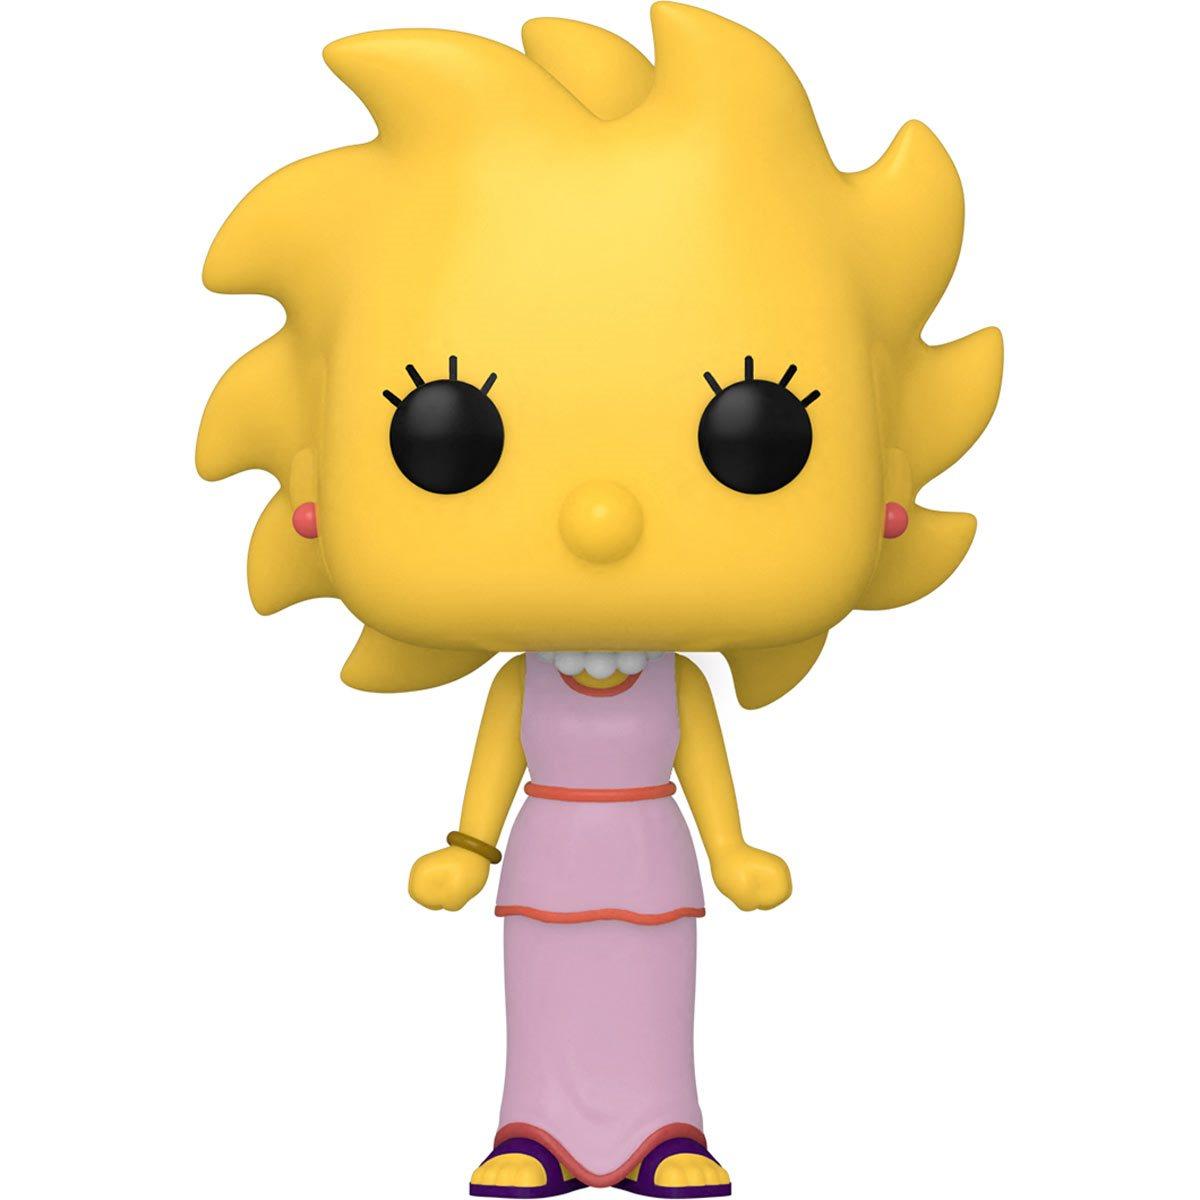 PRÉ VENDA: Funko Pop! Lisandra Lisa: Os Simpsons - Funko